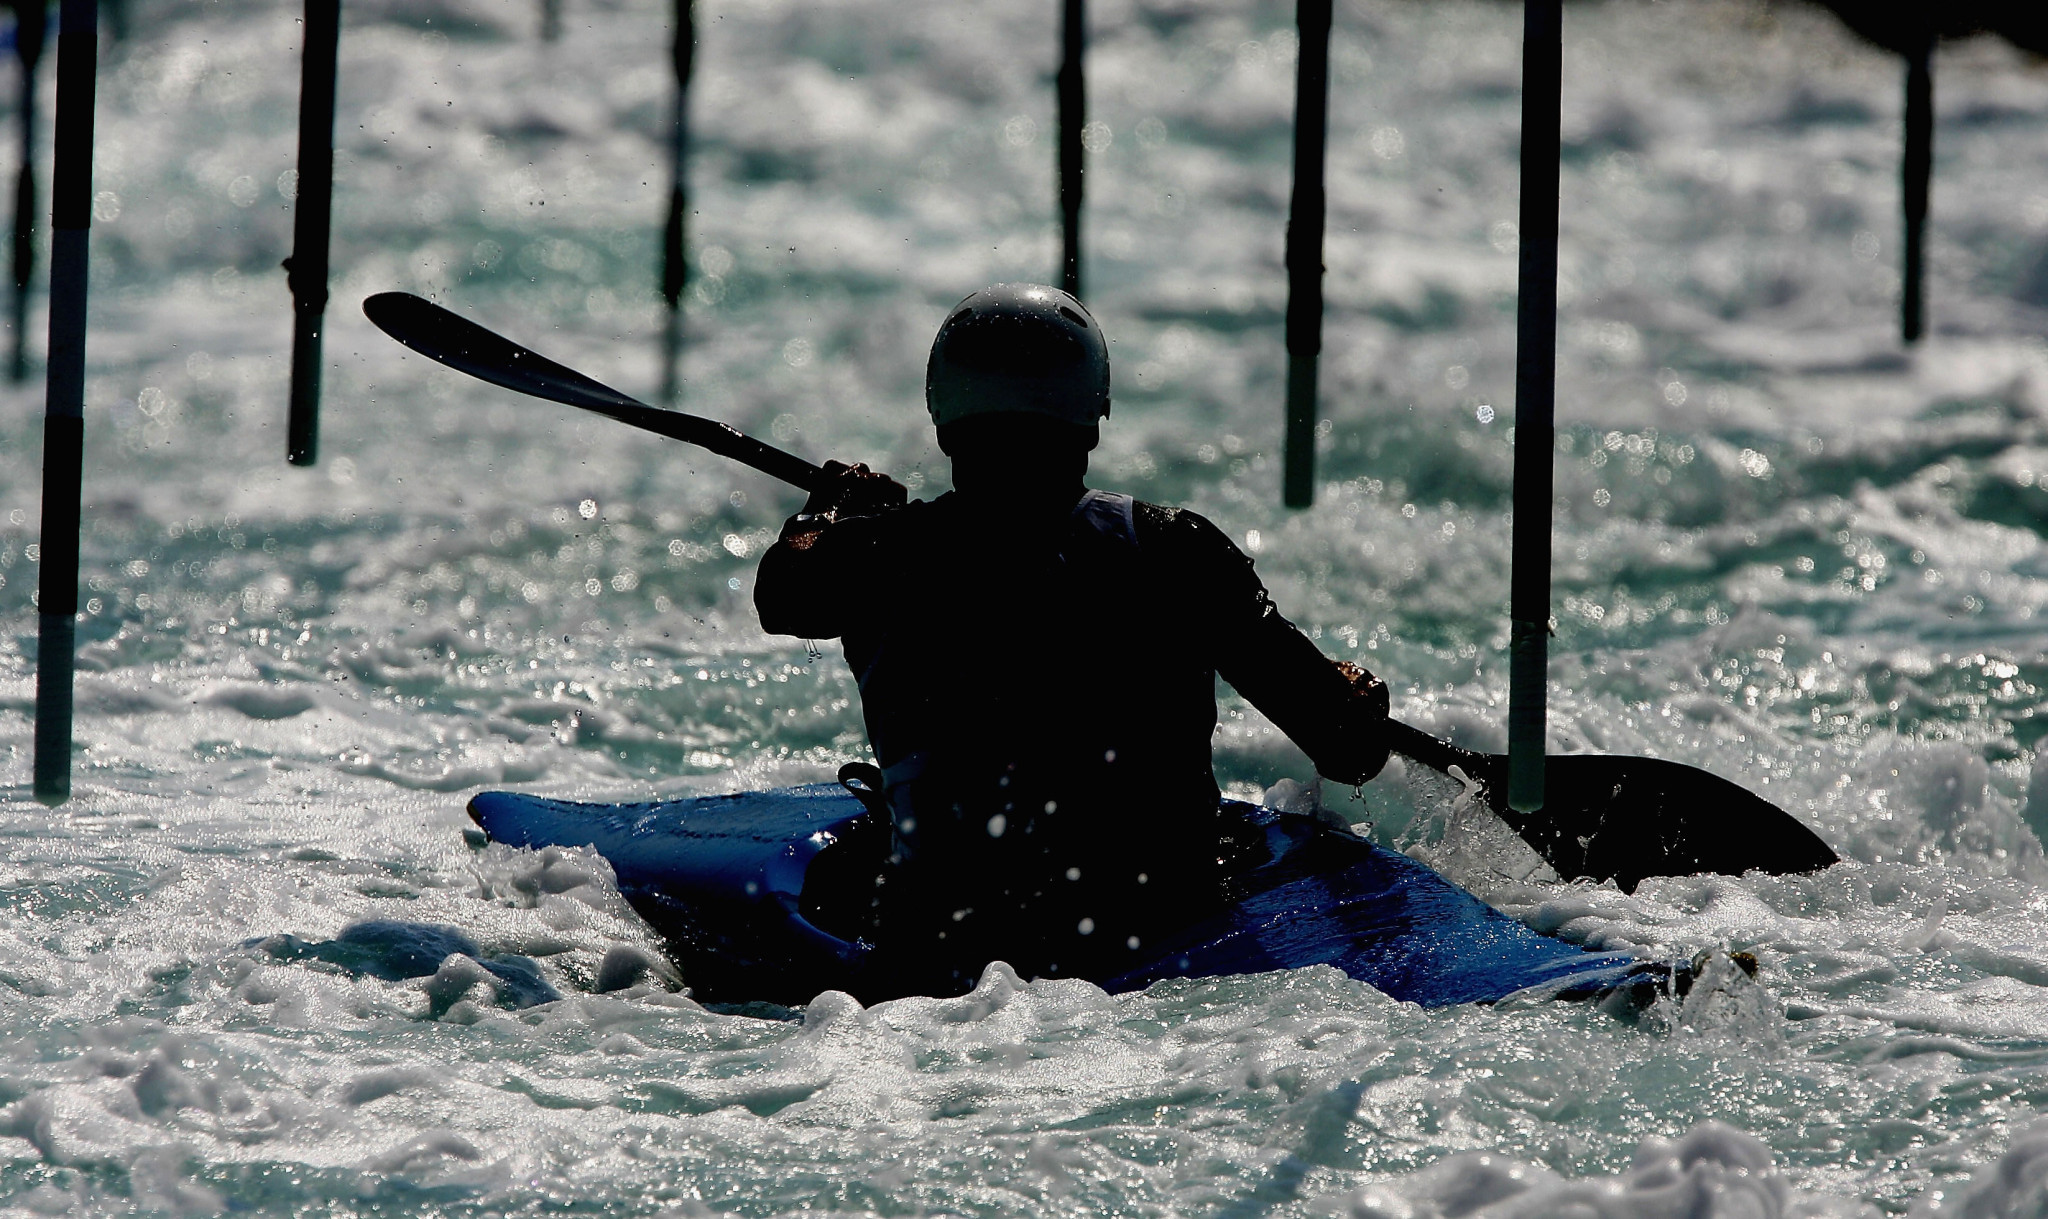 Moldovan Kayak-Canoe Federation President Buhna dies from coronavirus